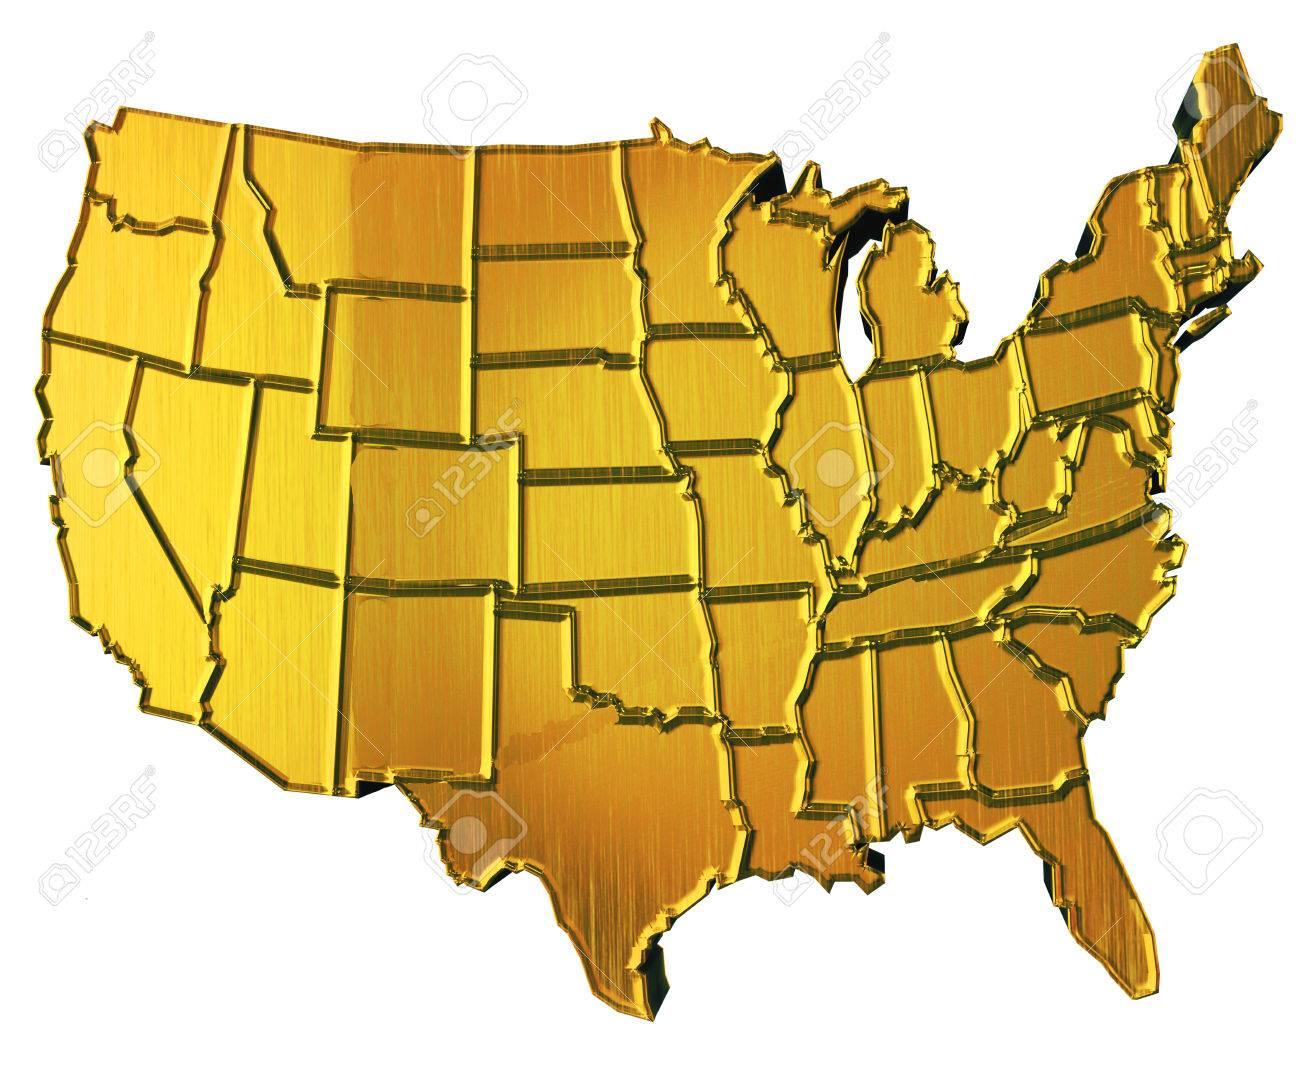 Utah Contour Stock Vector Illustration And Royalty Free Utah - Utah on a map of the usa